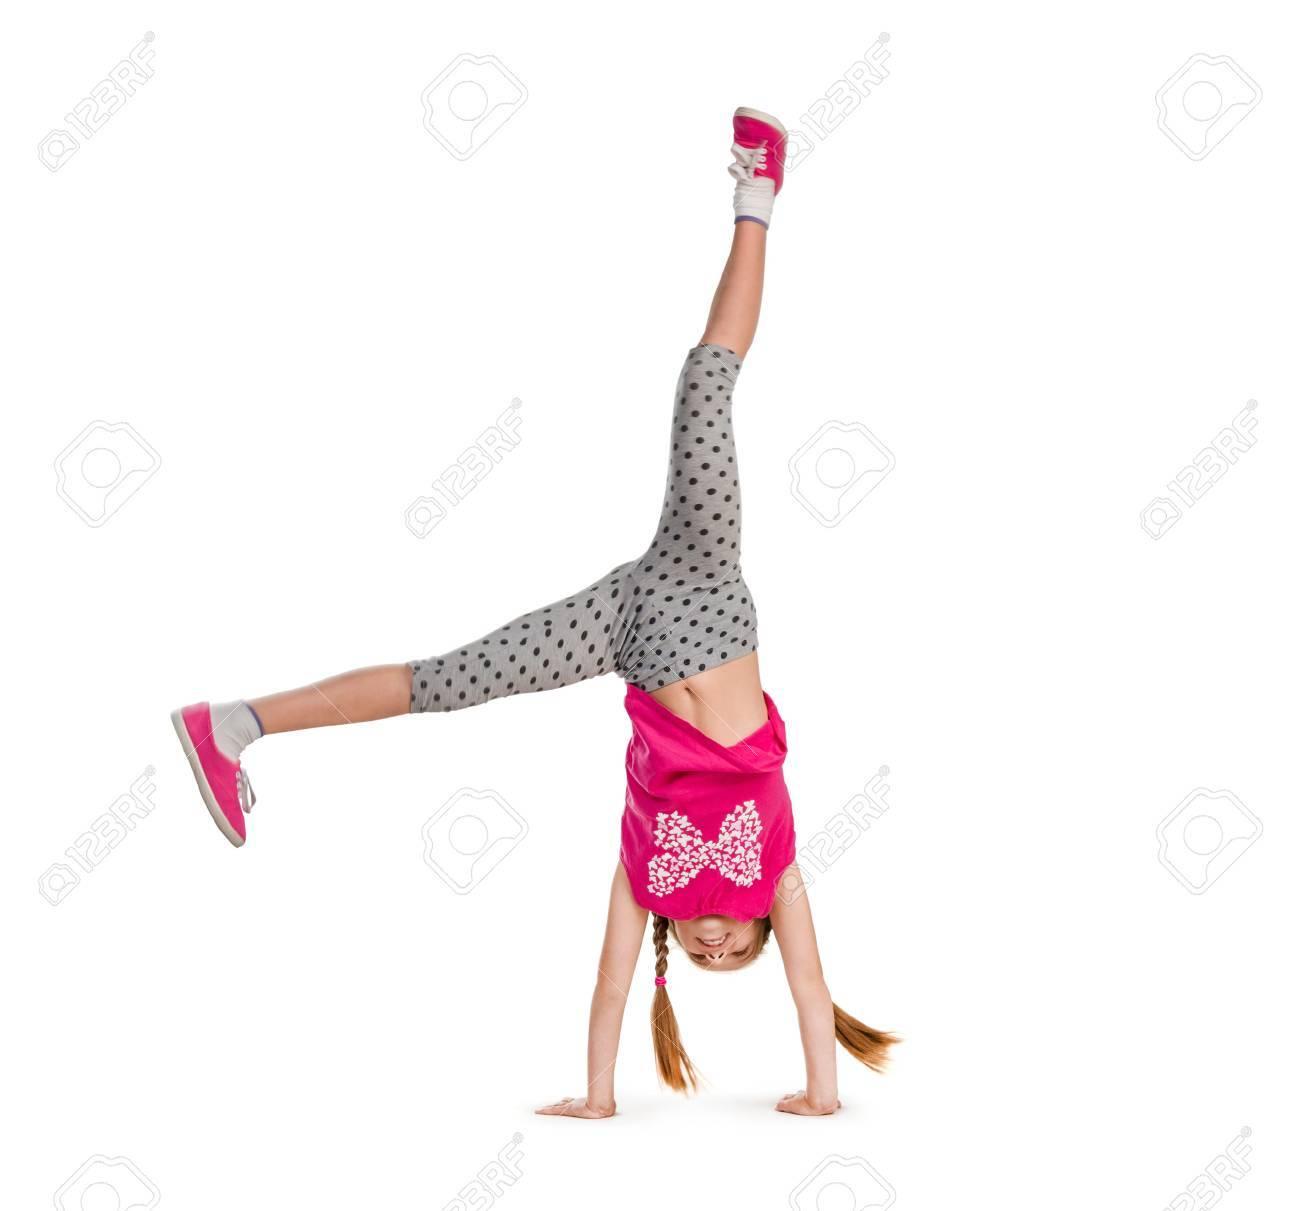 little girl turning handsprings in a studio - 44481610